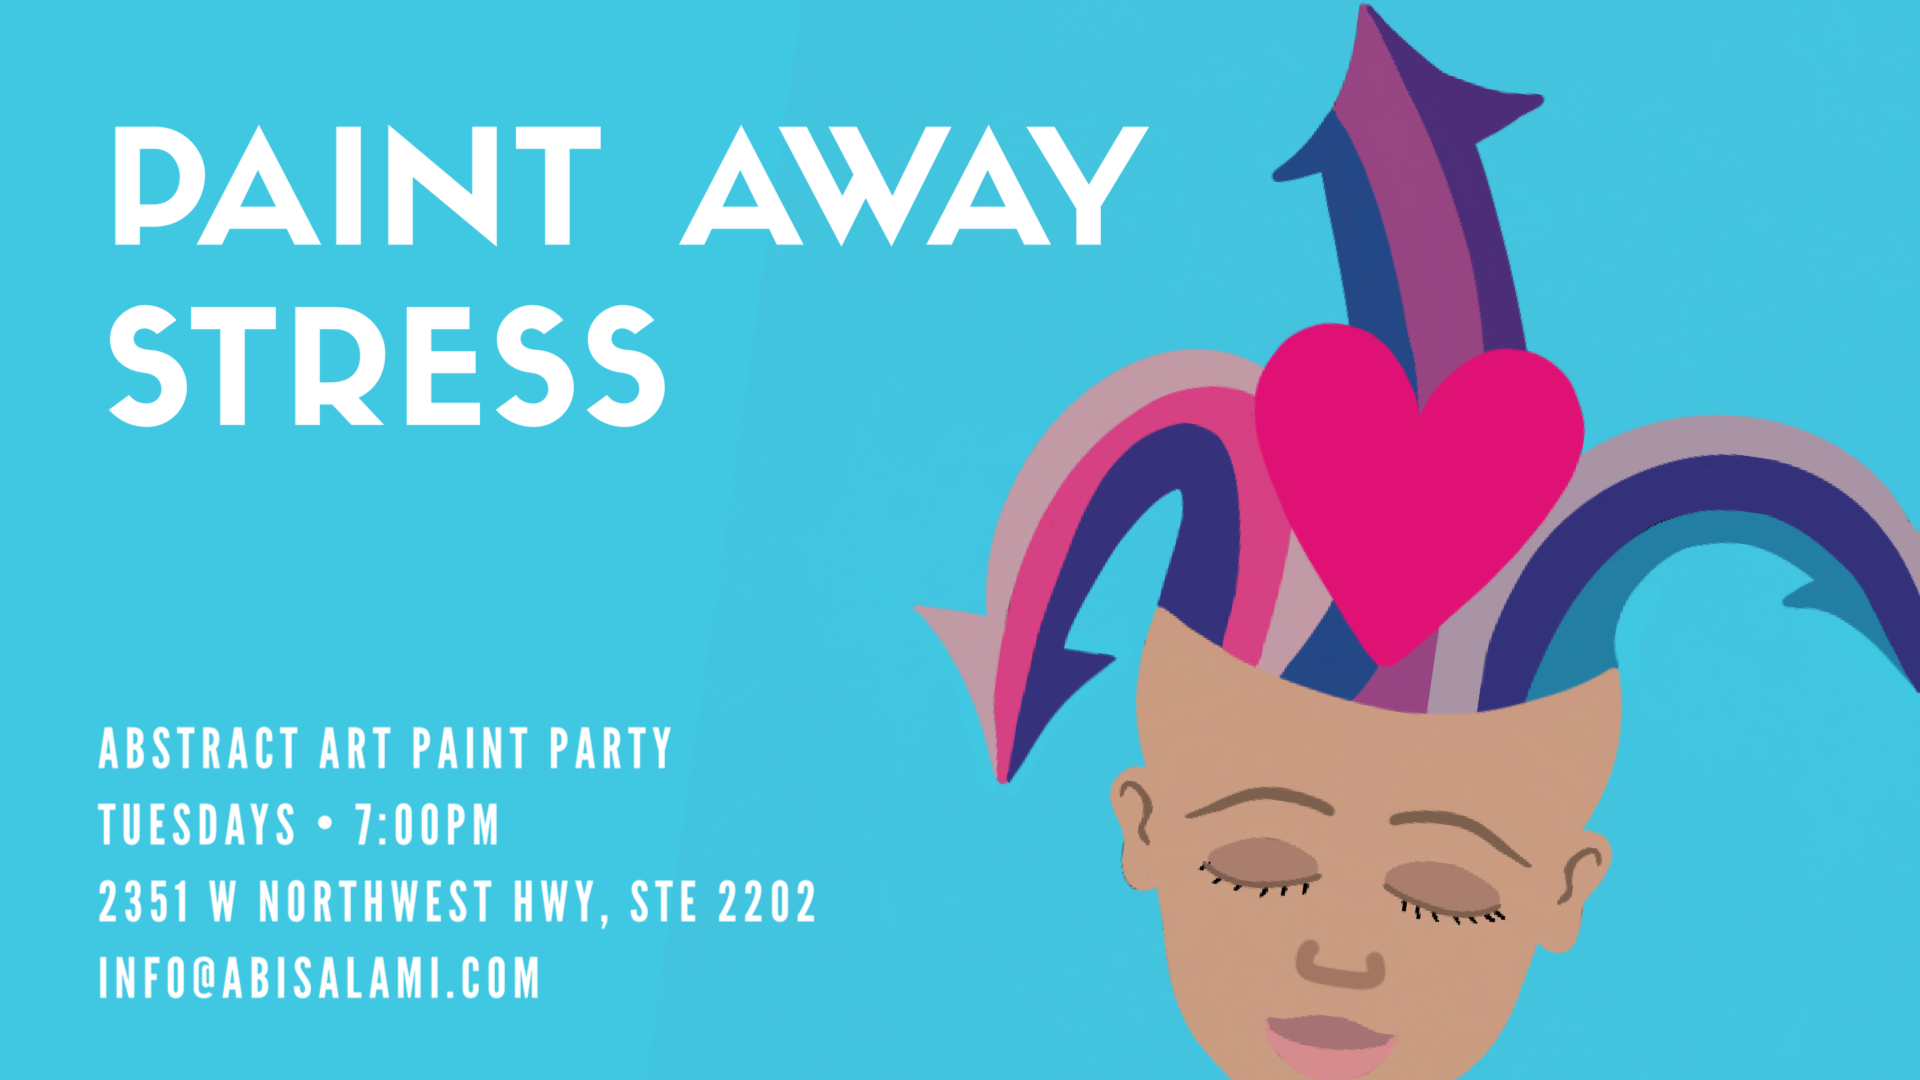 Paint Stress Away